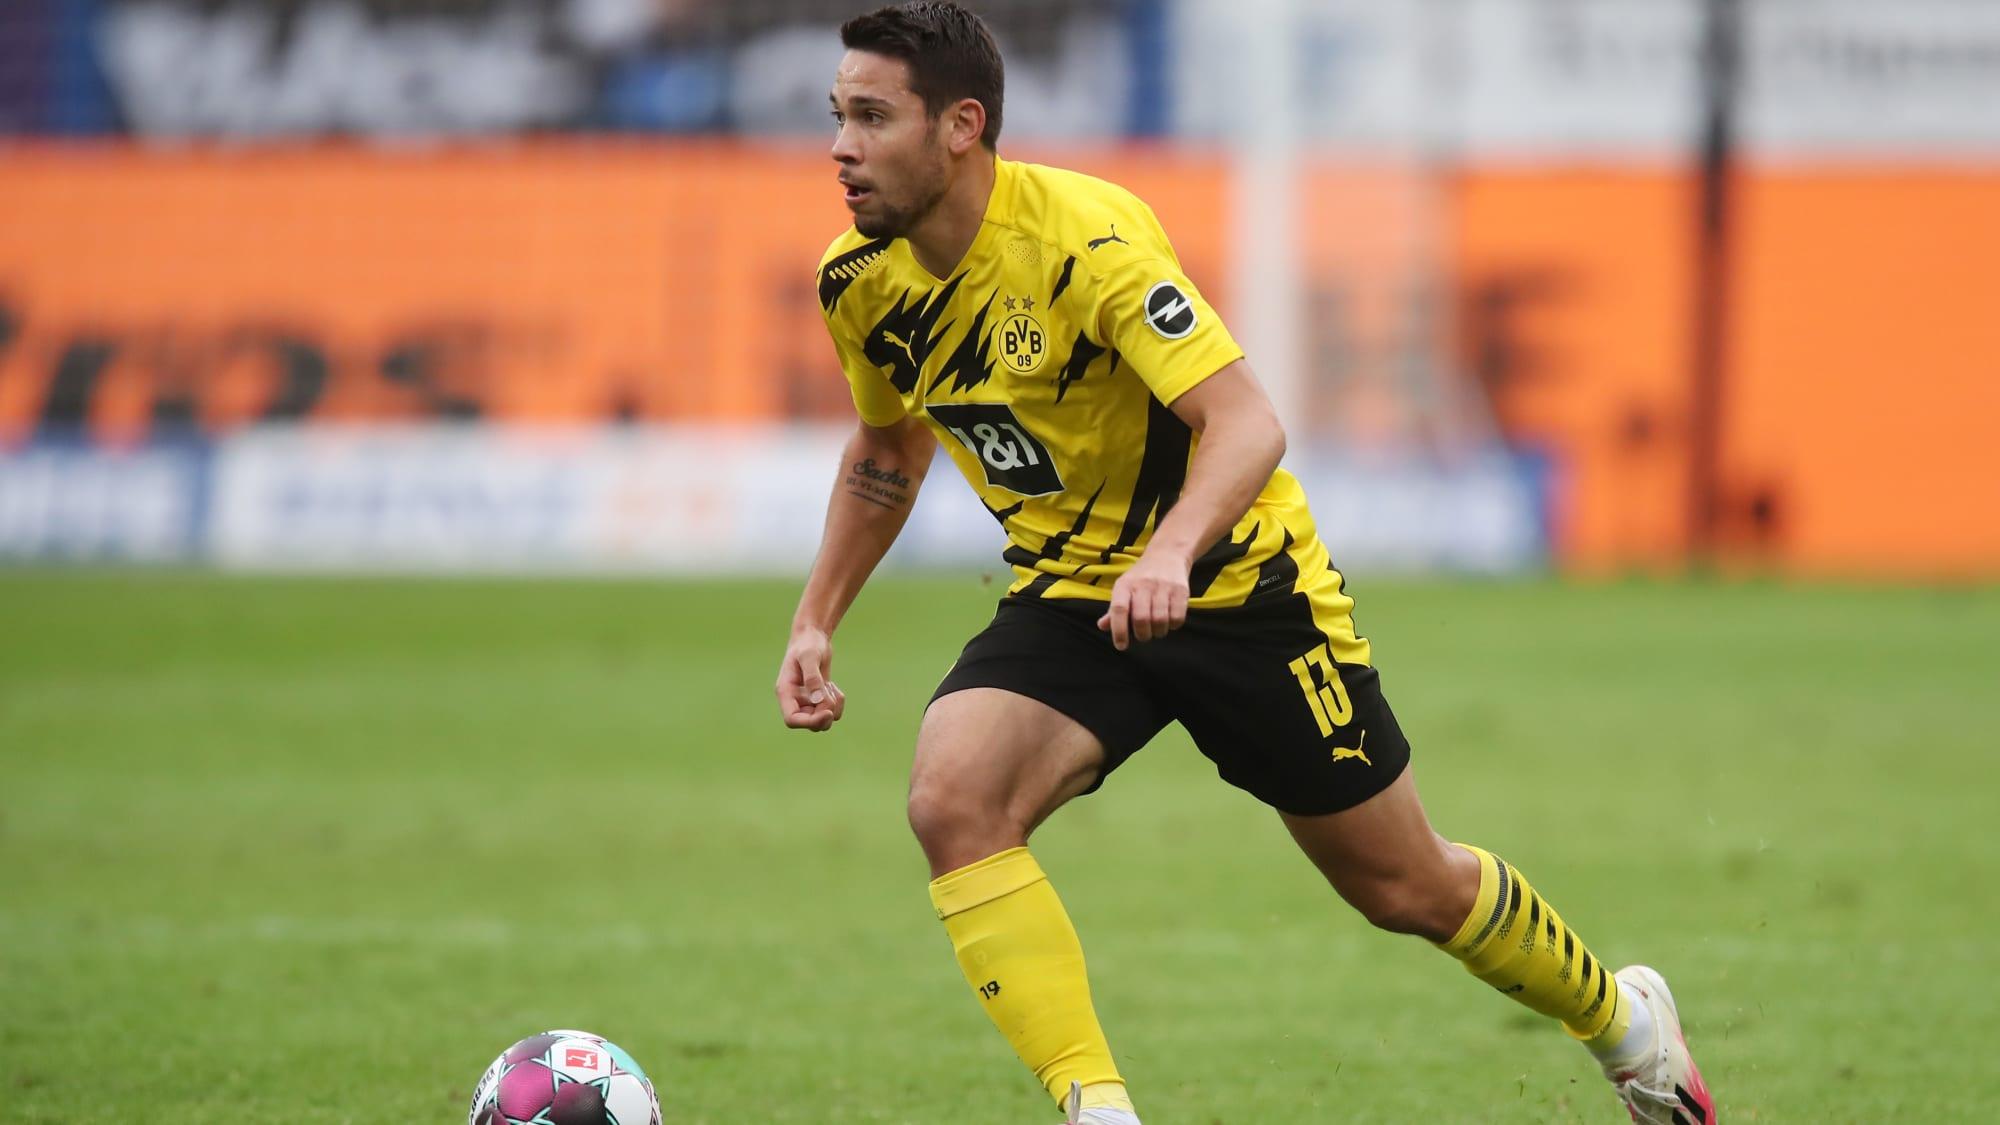 Dortmund Verteidiger